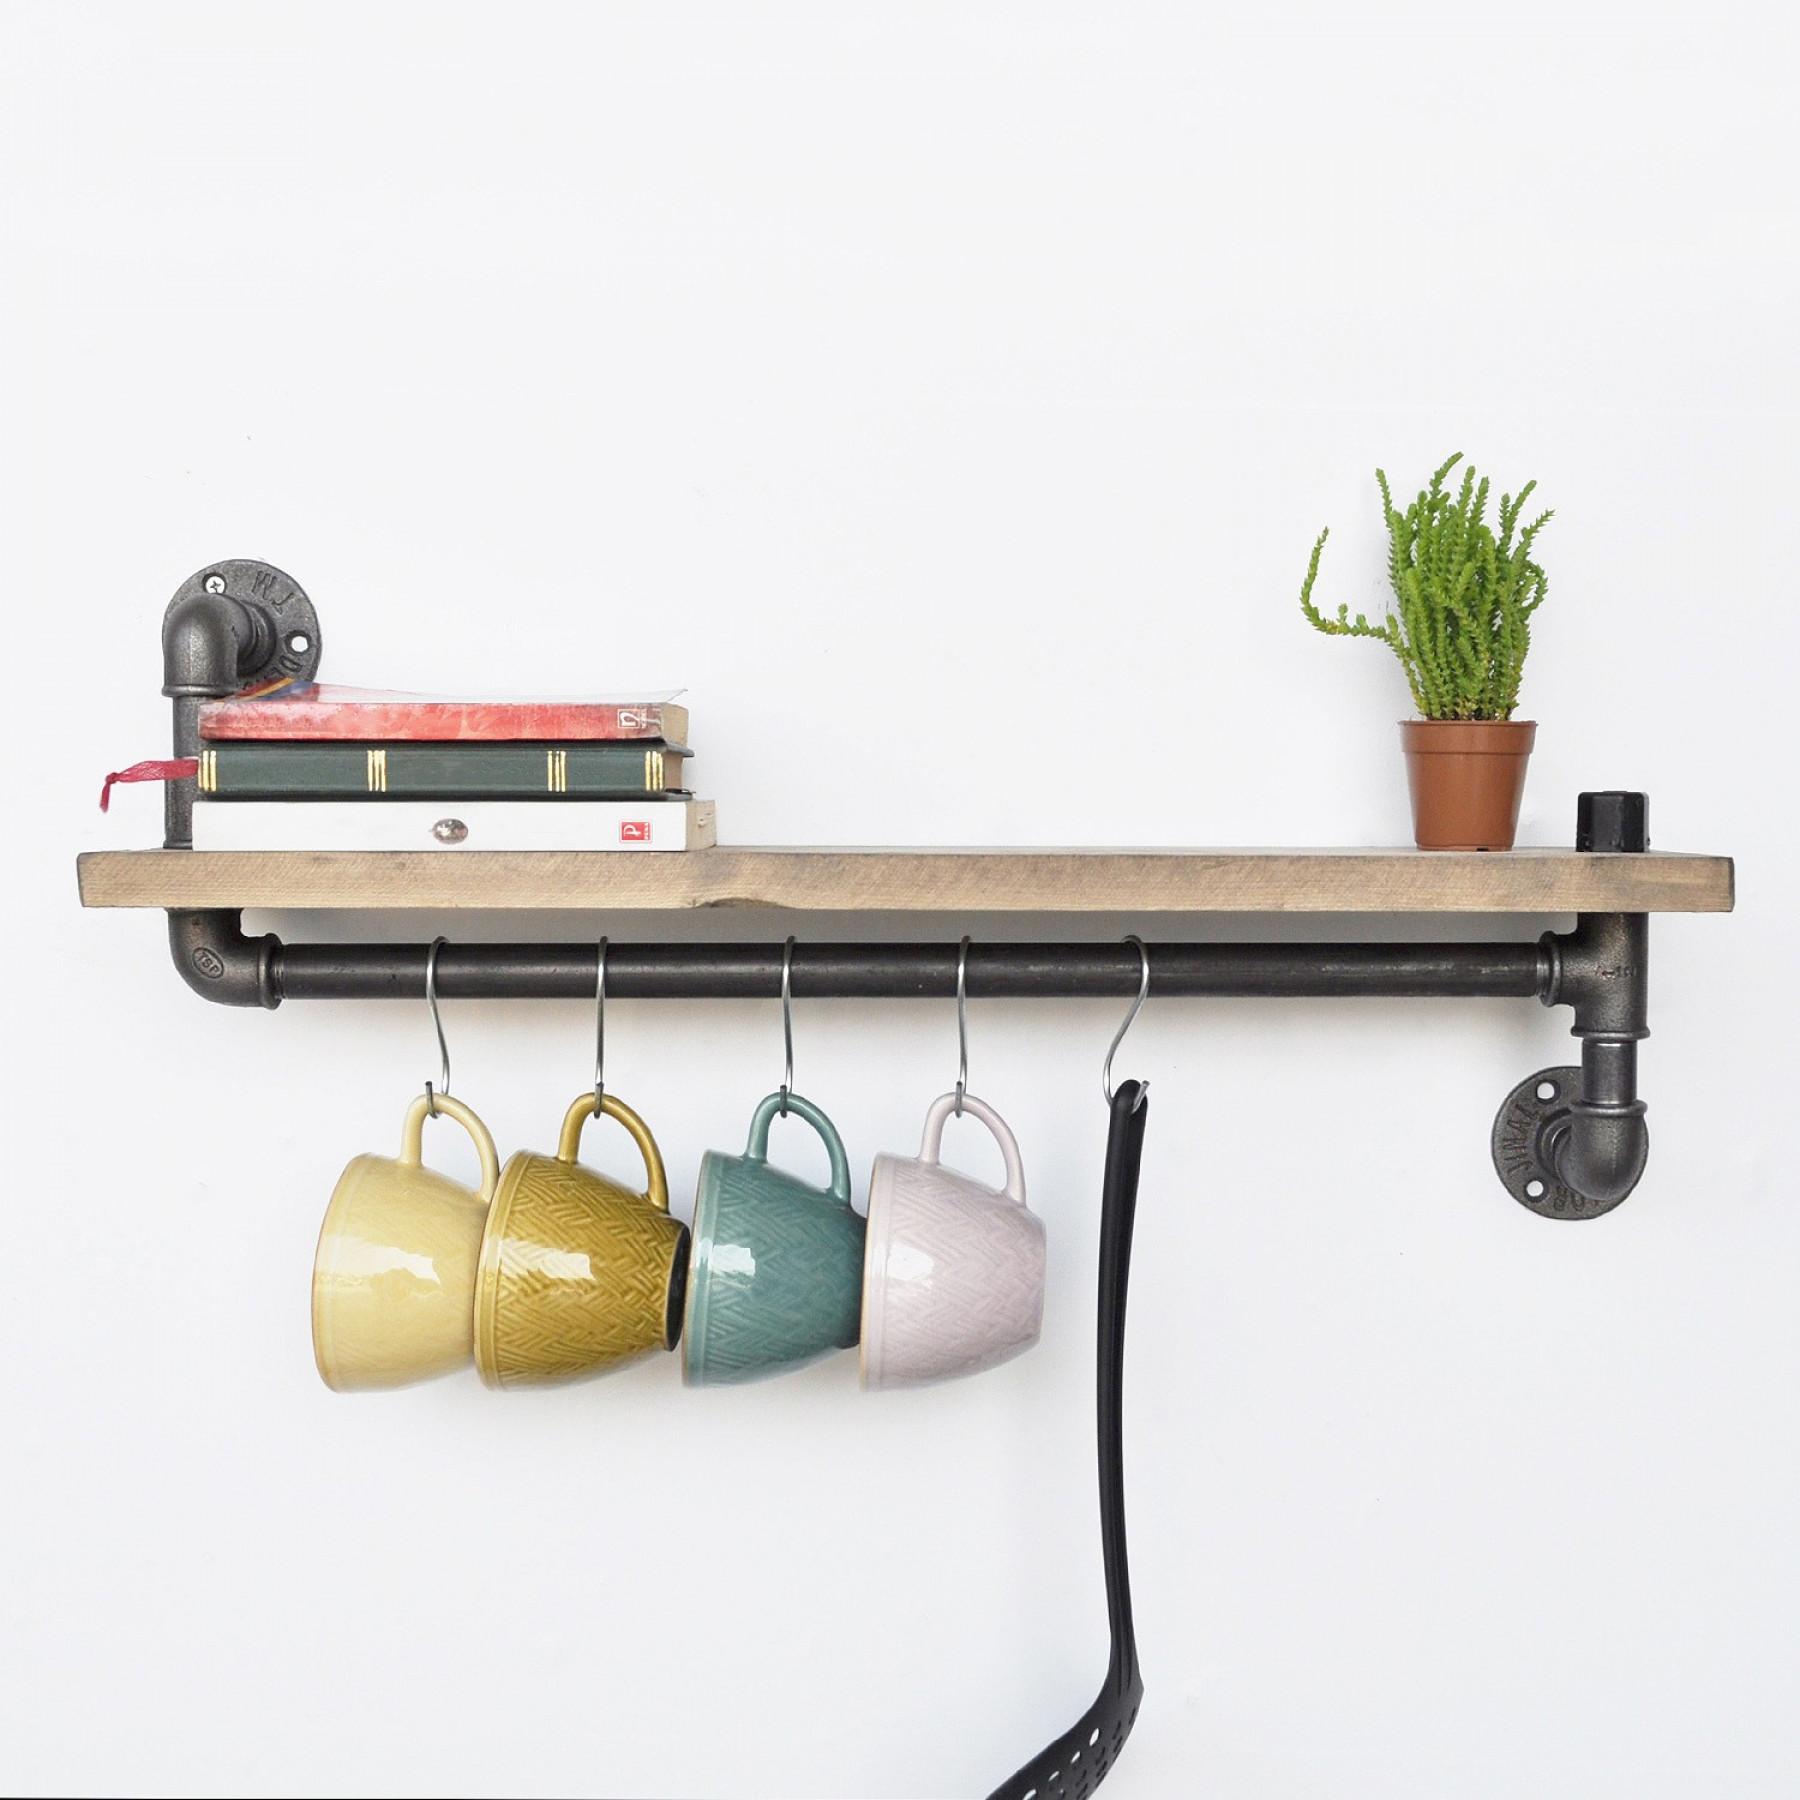 Pipe Shelf with 5 Metal Hooks